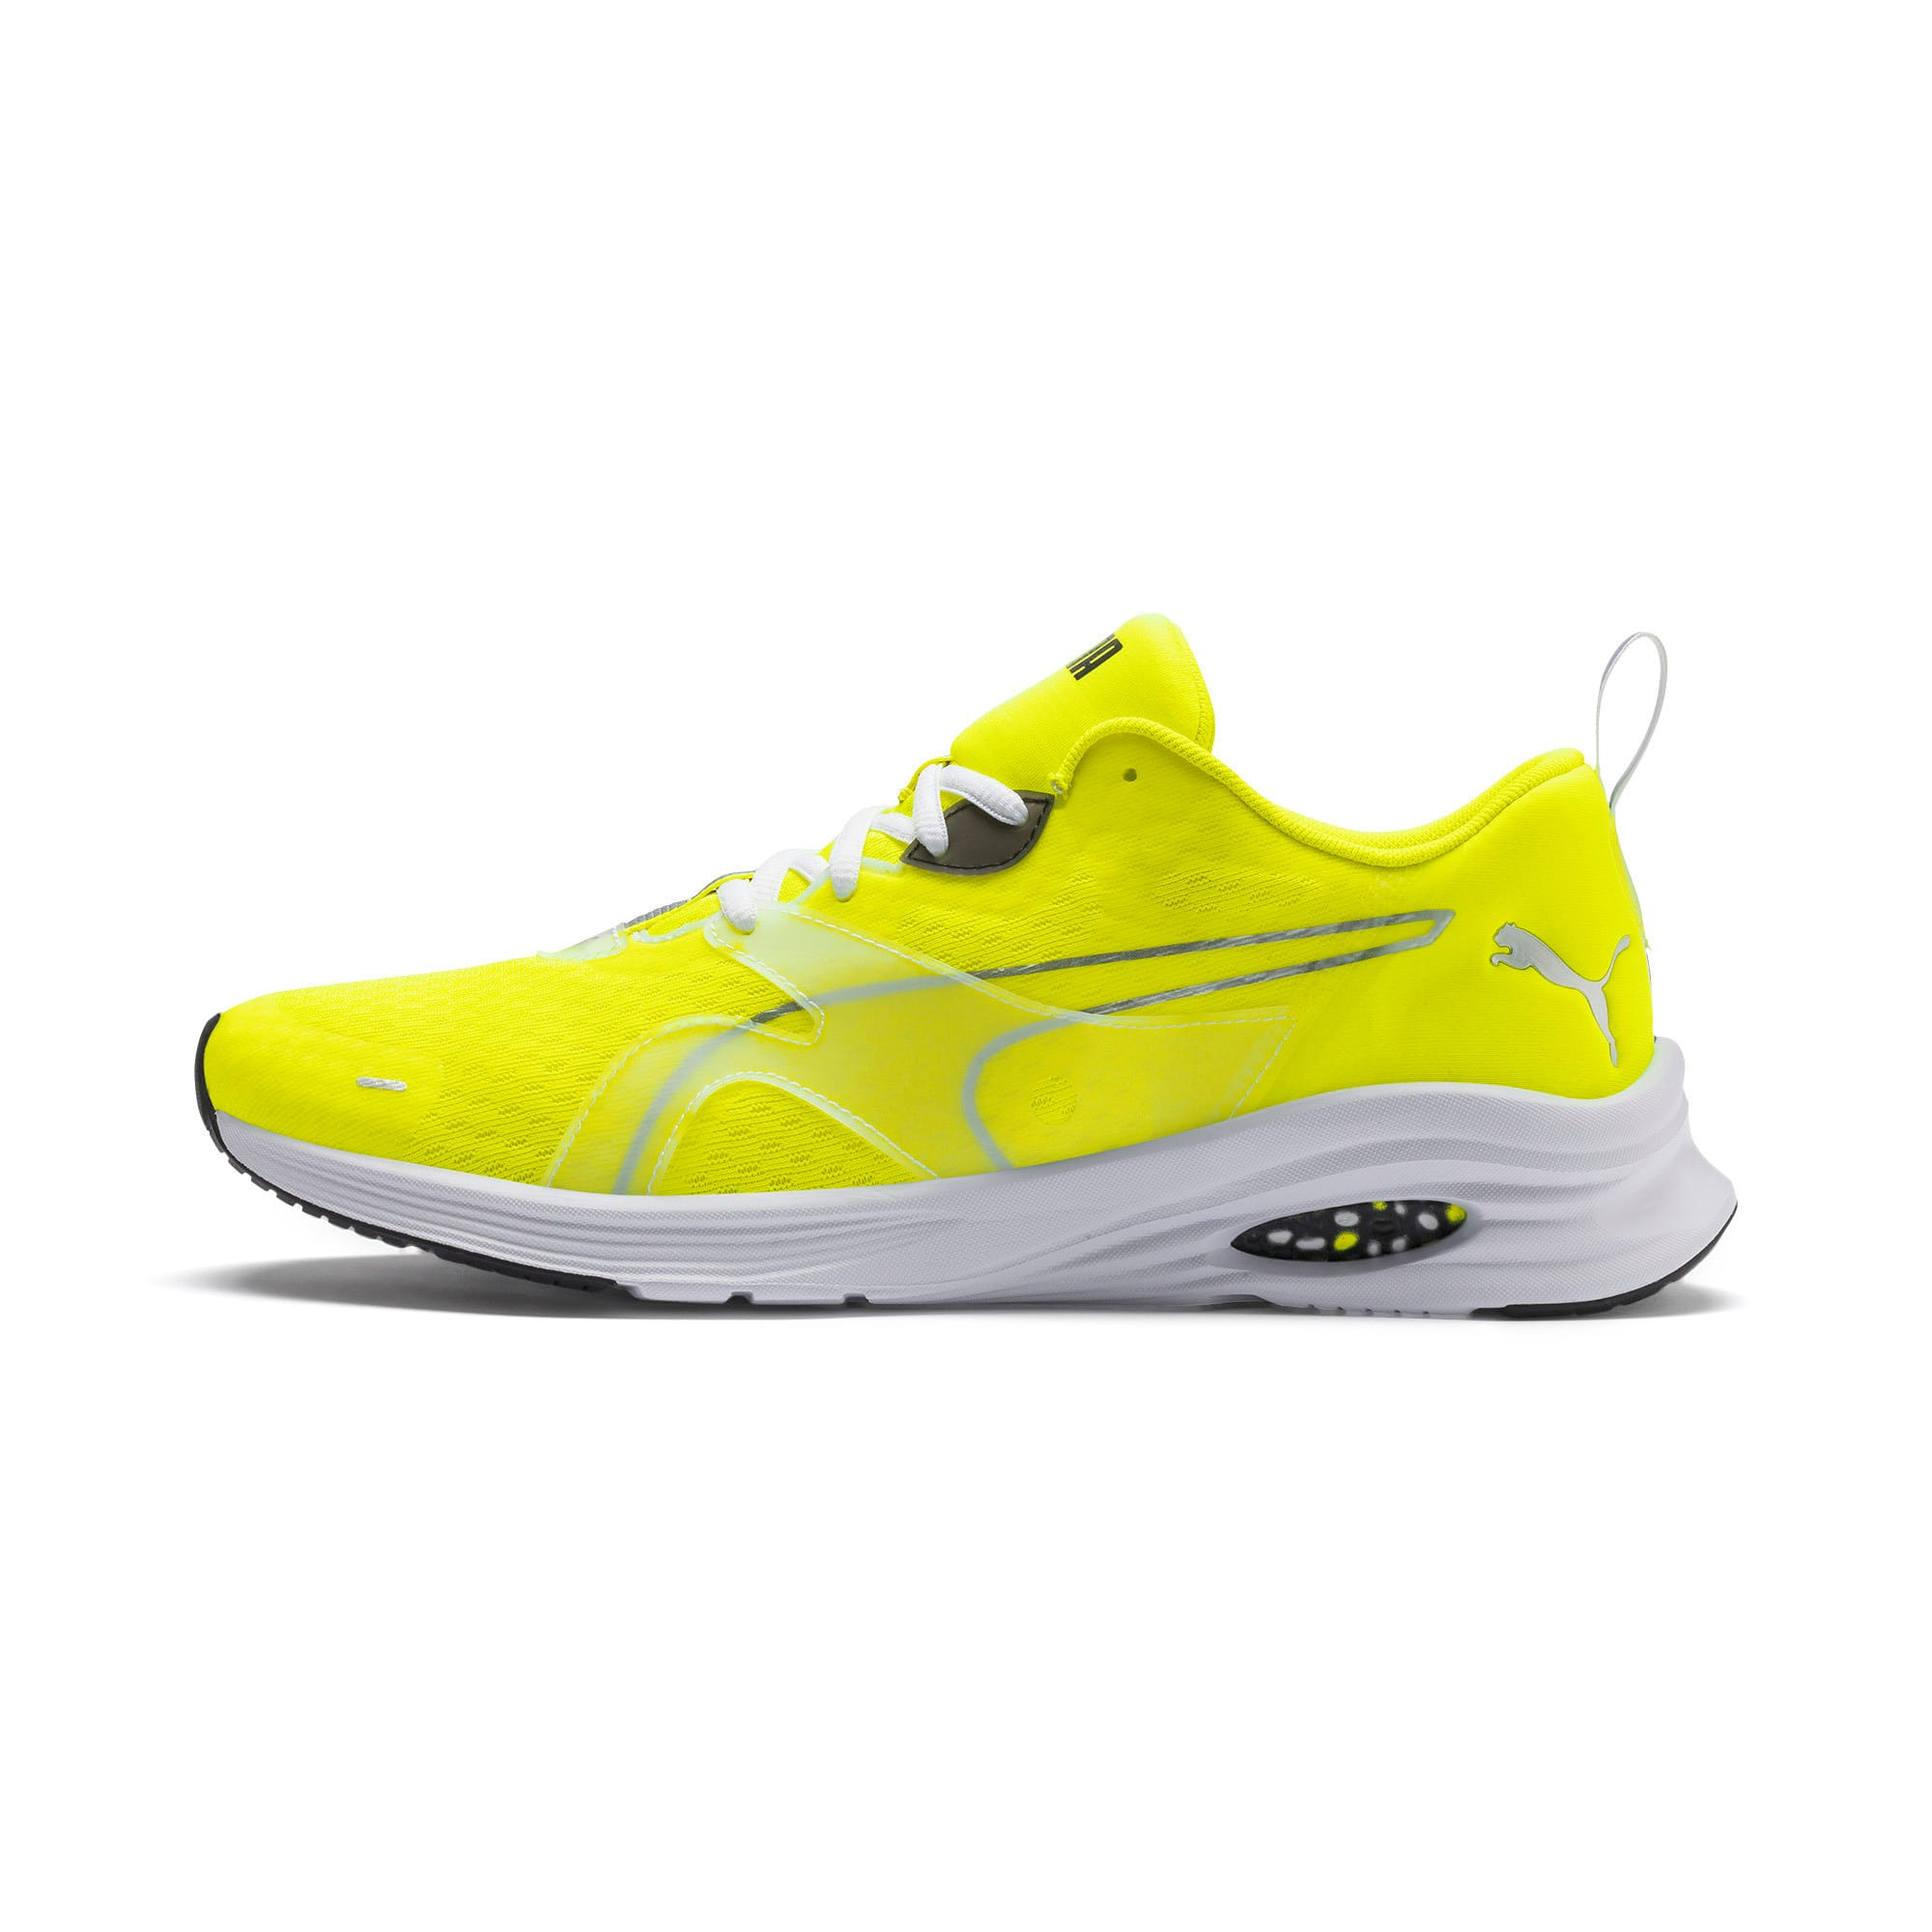 Thumbnail 1 of HYBRID Fuego Lights Men's Running Shoes, Yellow Alert, medium